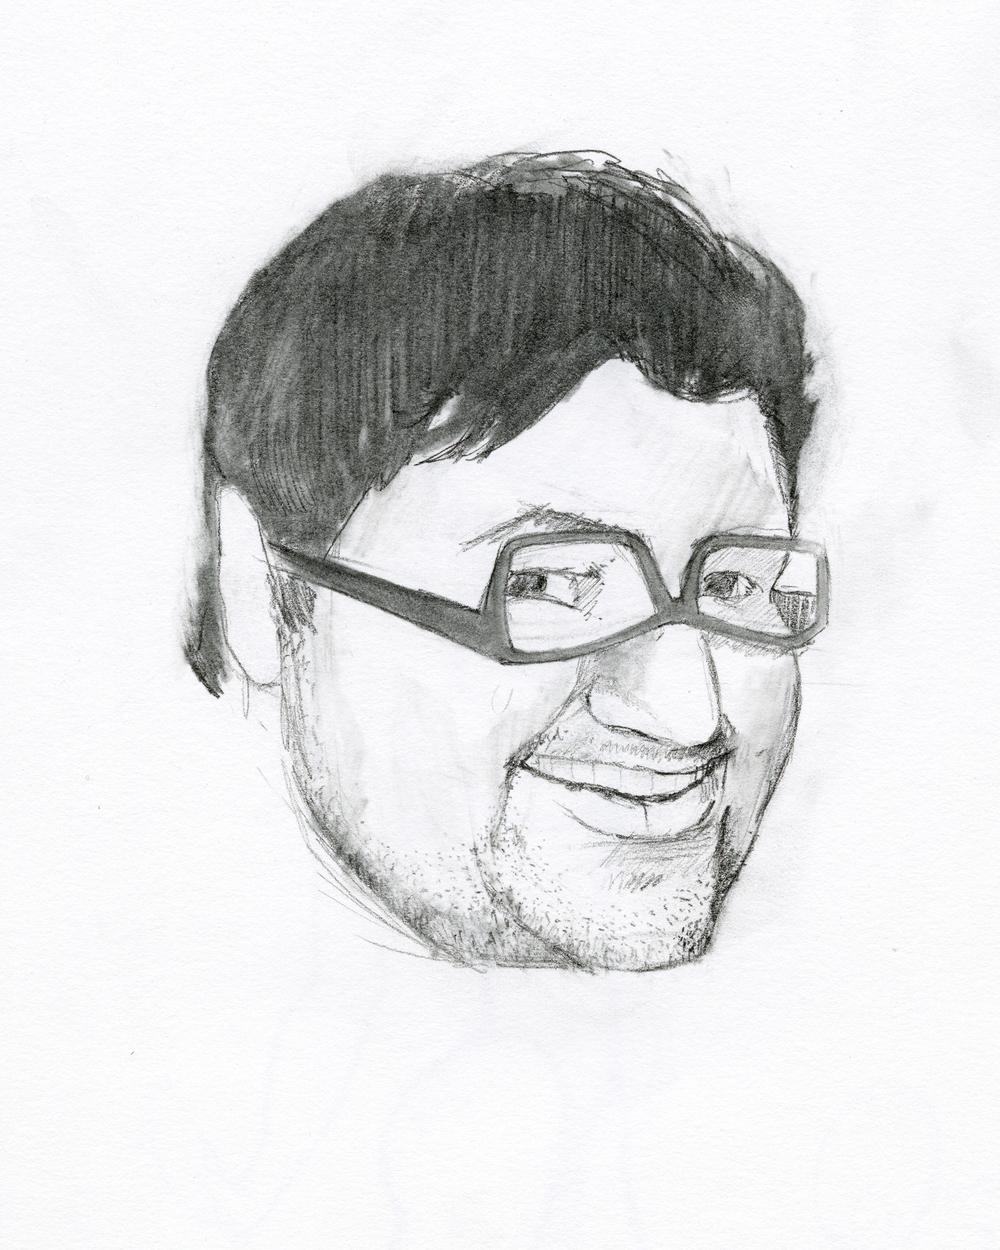 sketch-sean_david-jackowski_alvatron-studio.jpg